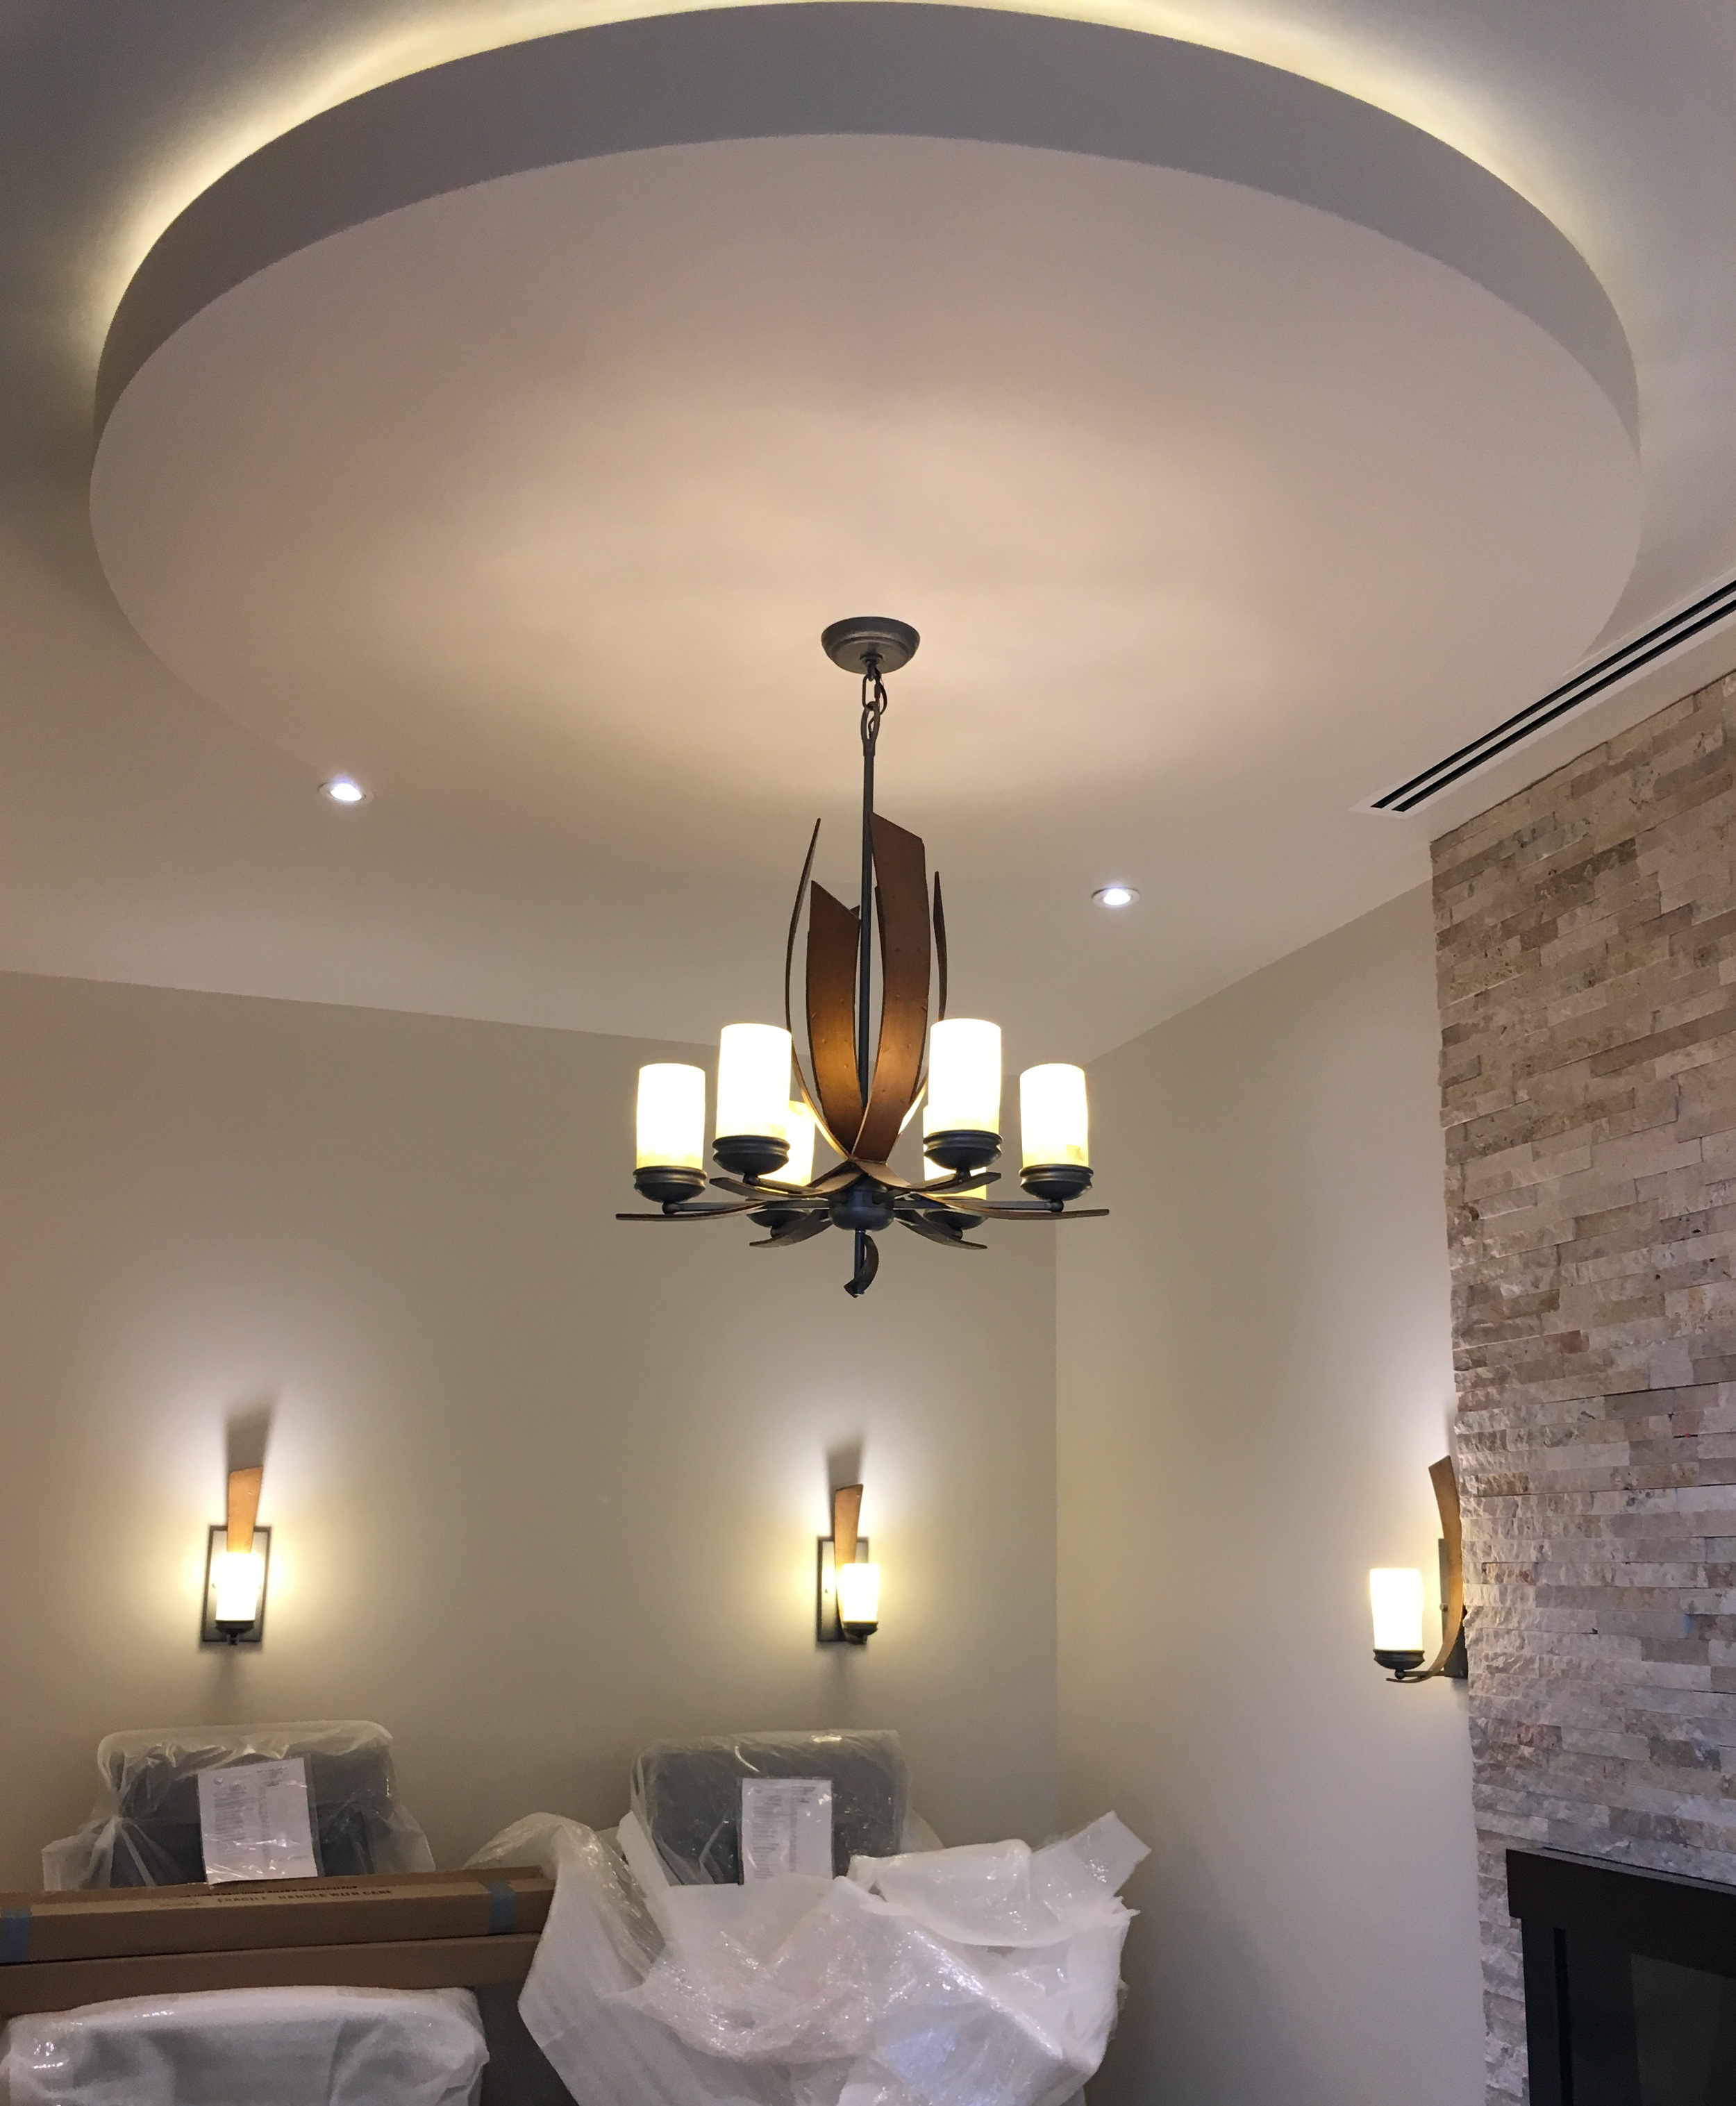 INTERIOR  Work in progress: custom lighting & finishes,procurement, FFF&E coordination